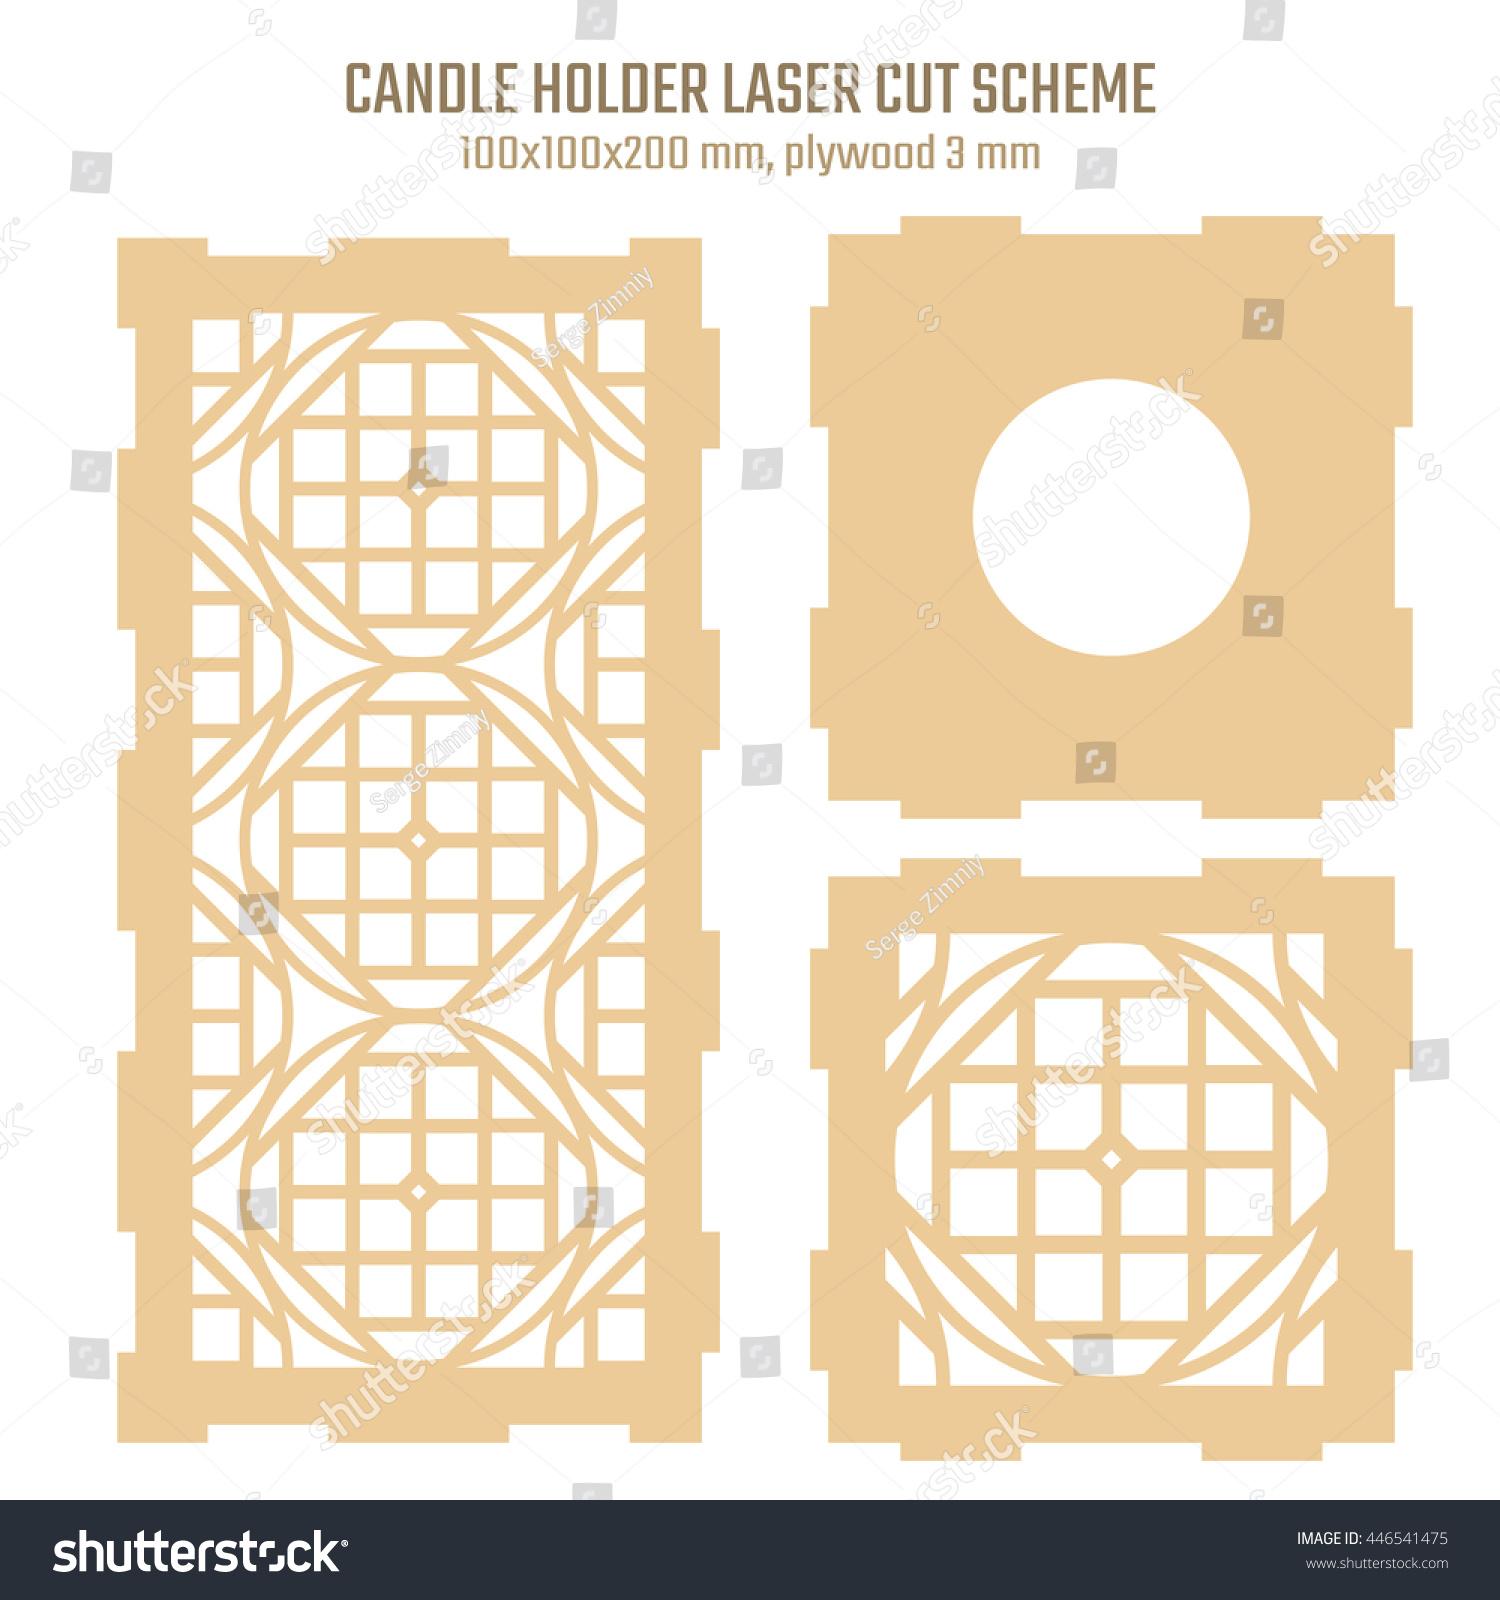 diy laser cutting vector scheme candle stock vector. Black Bedroom Furniture Sets. Home Design Ideas